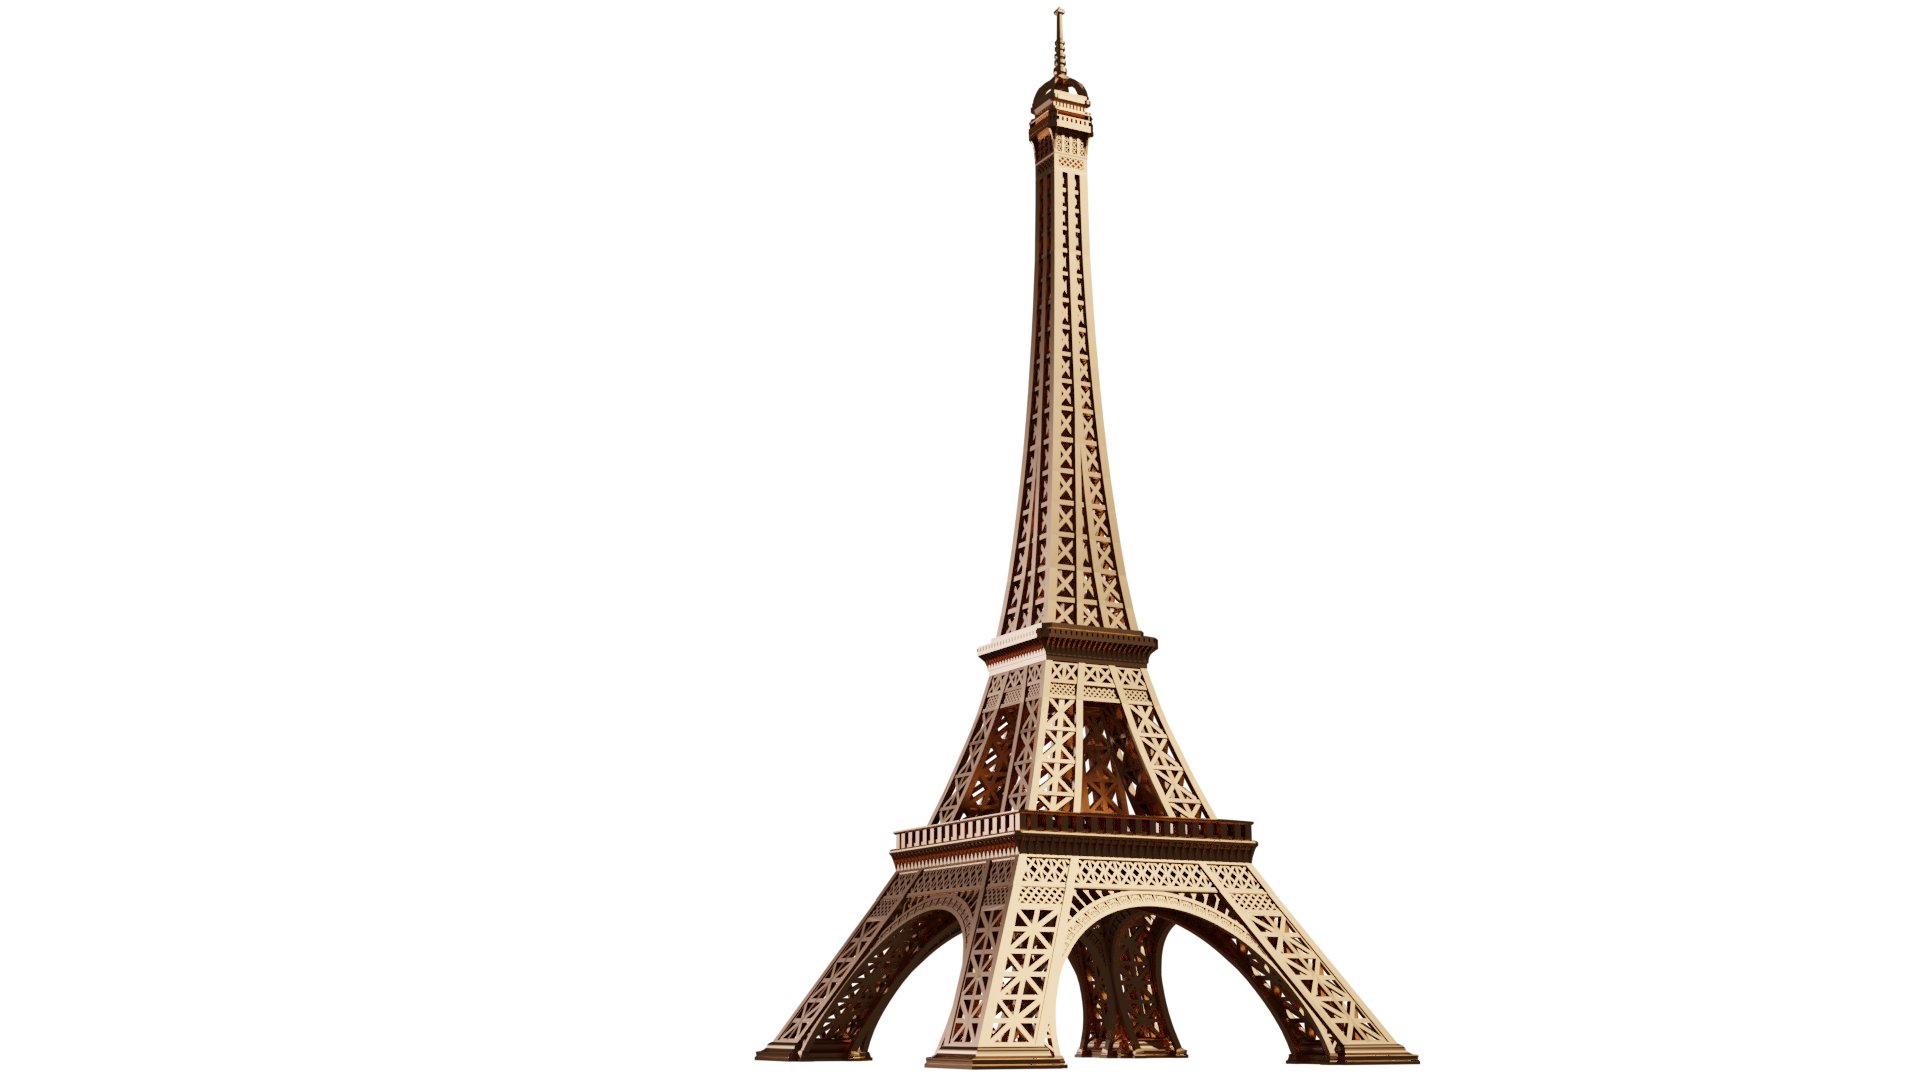 3д модель Эйф. башни